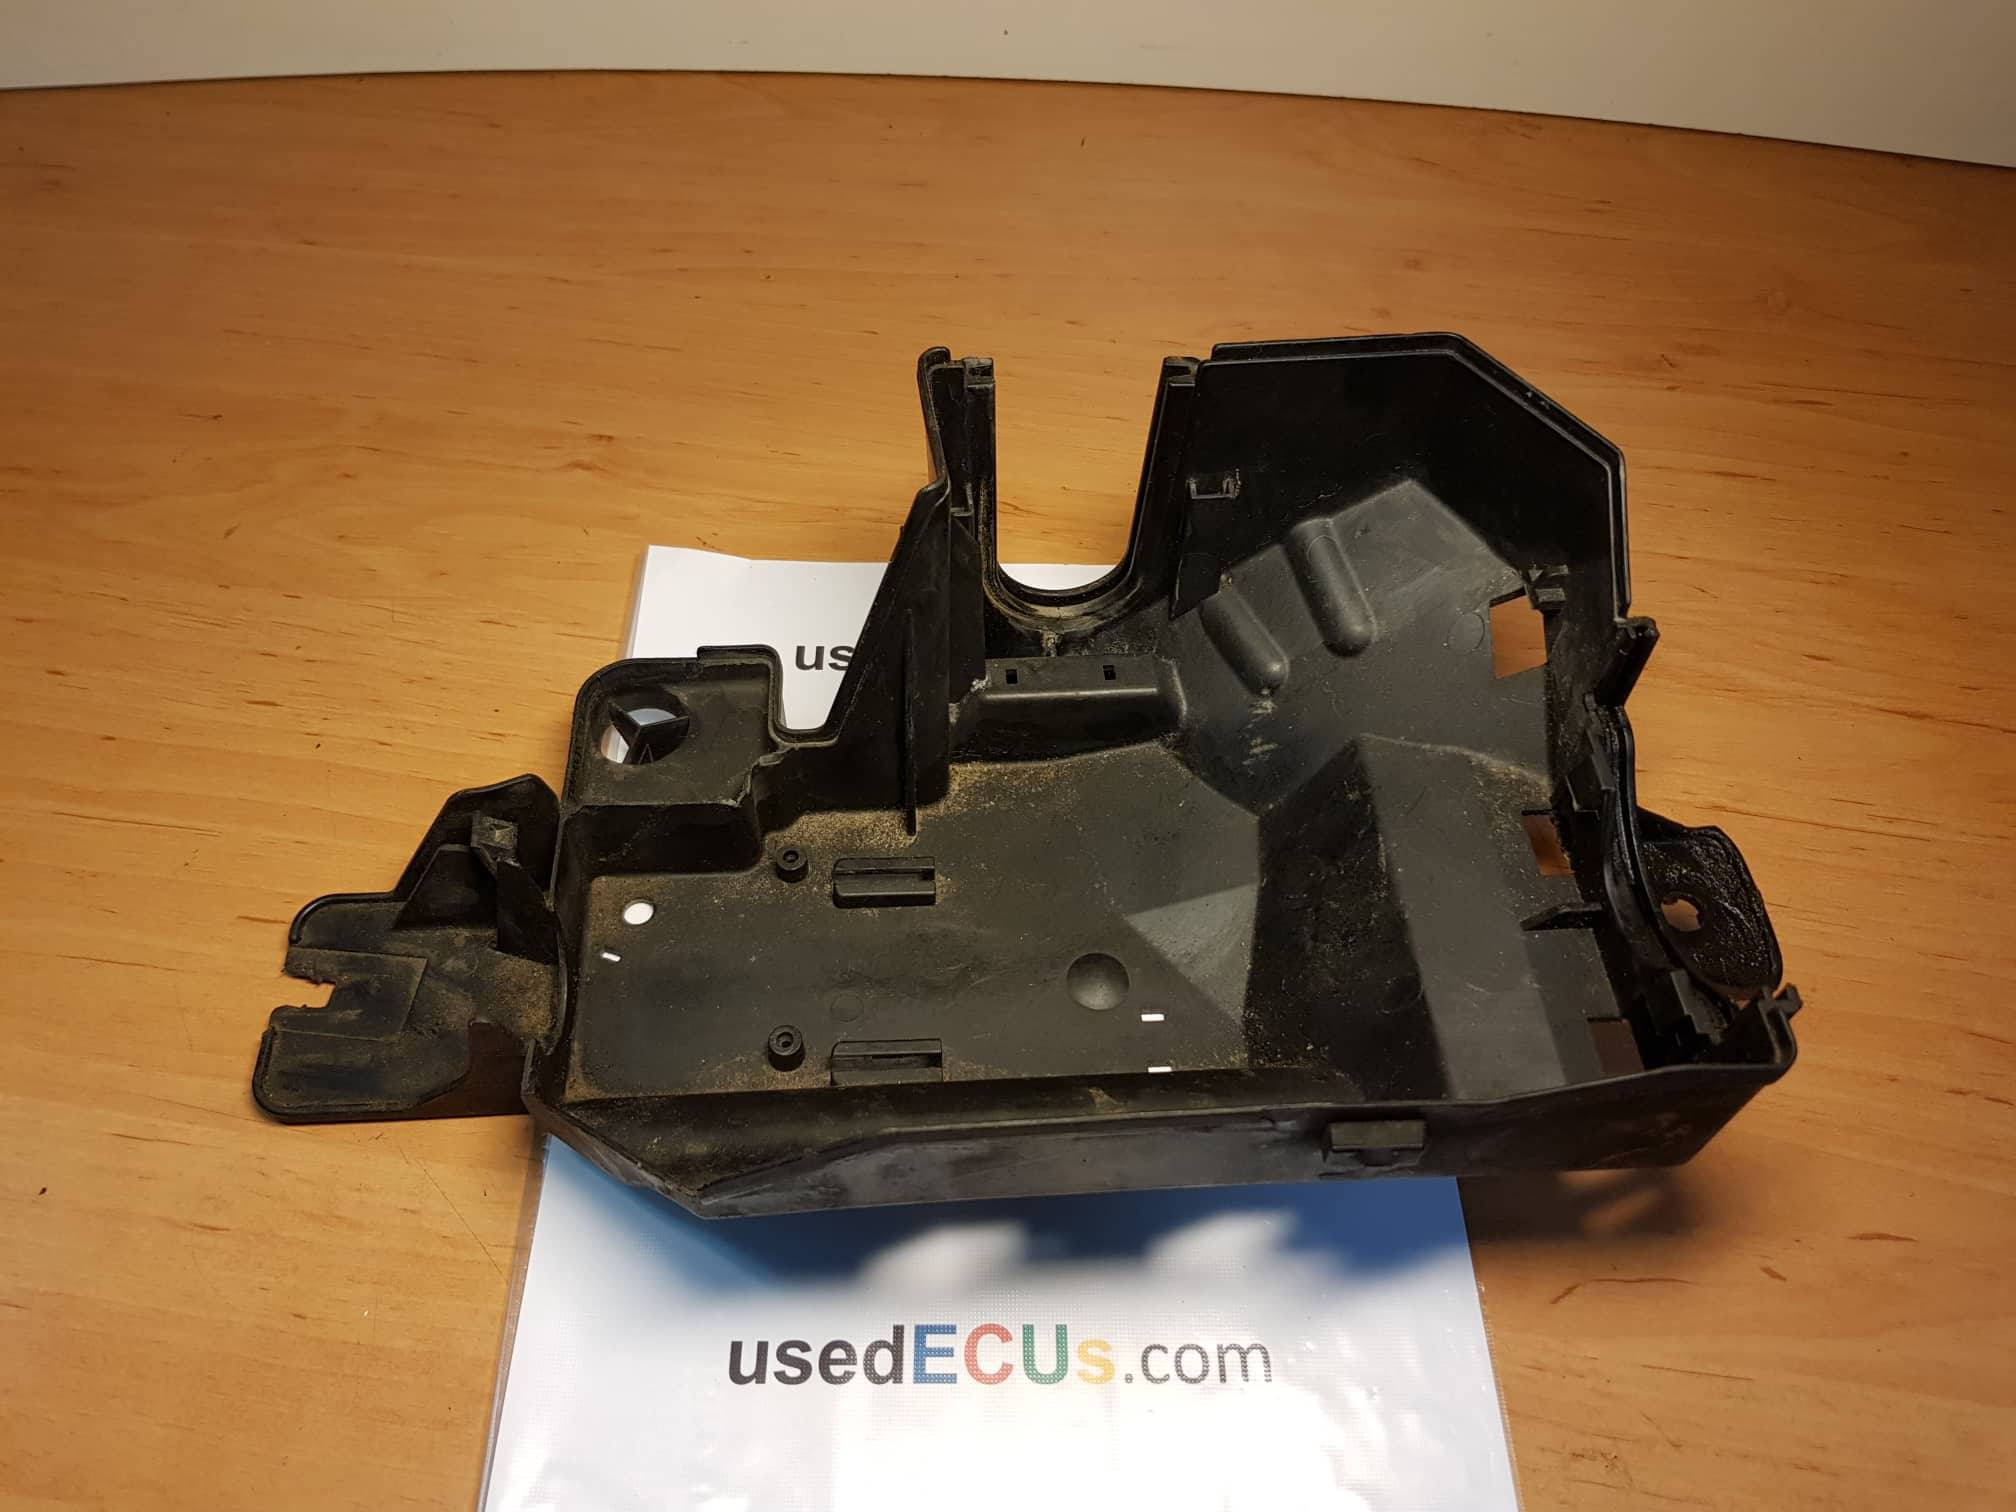 volvo xc70, v70, s60, s80, 2000-07, fuse box, ecu tray box (article:  9452547)